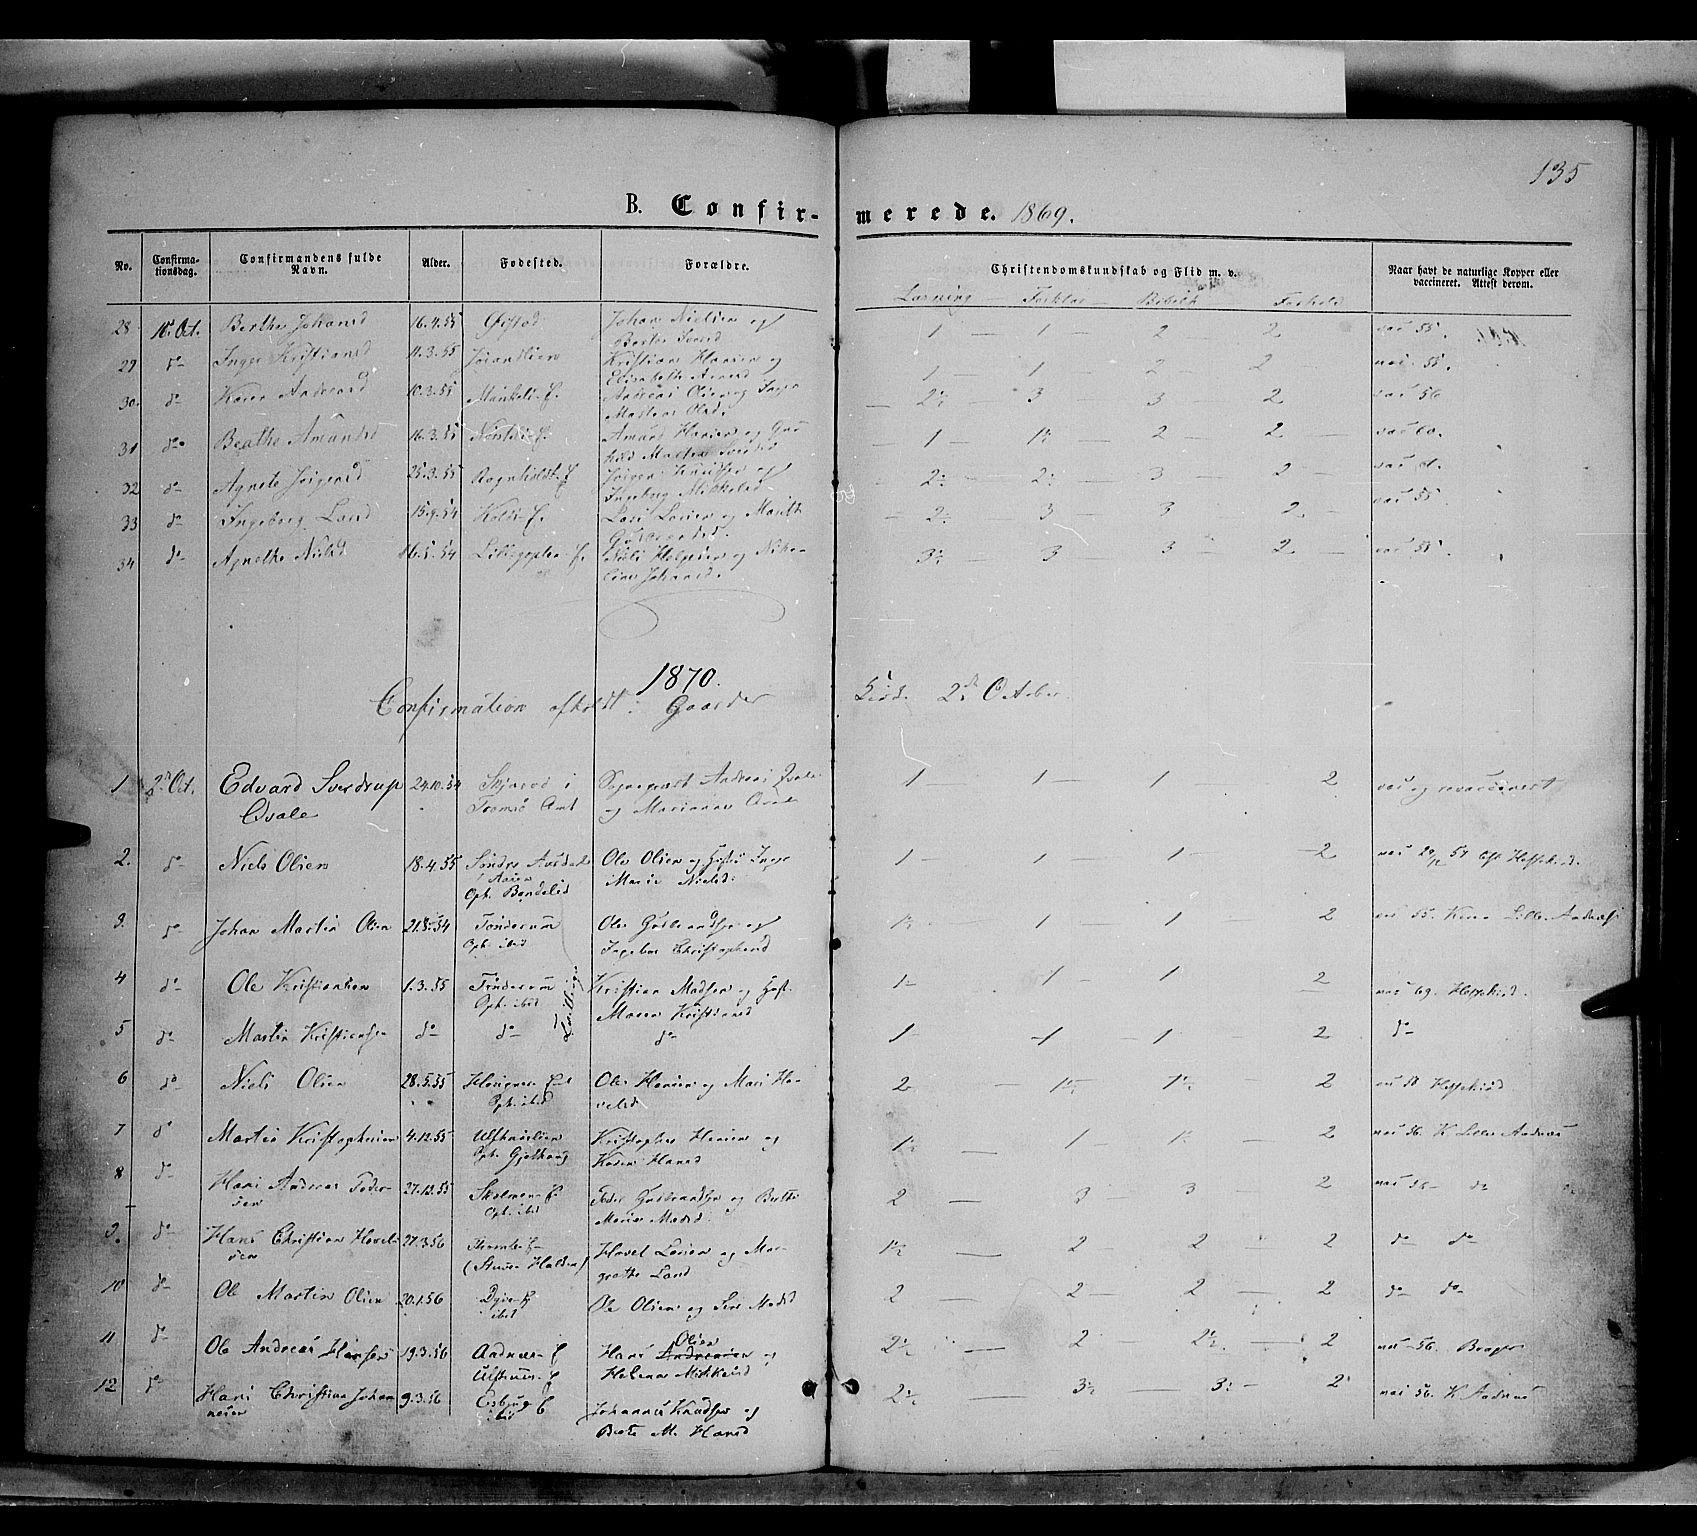 SAH, Nordre Land prestekontor, Ministerialbok nr. 1, 1860-1871, s. 135